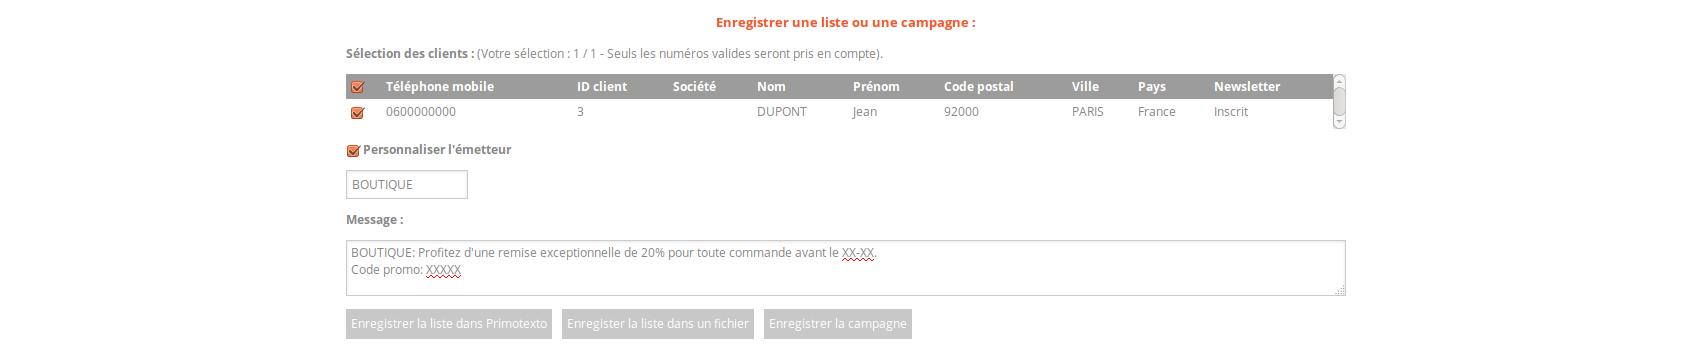 Prestashop - Campagne